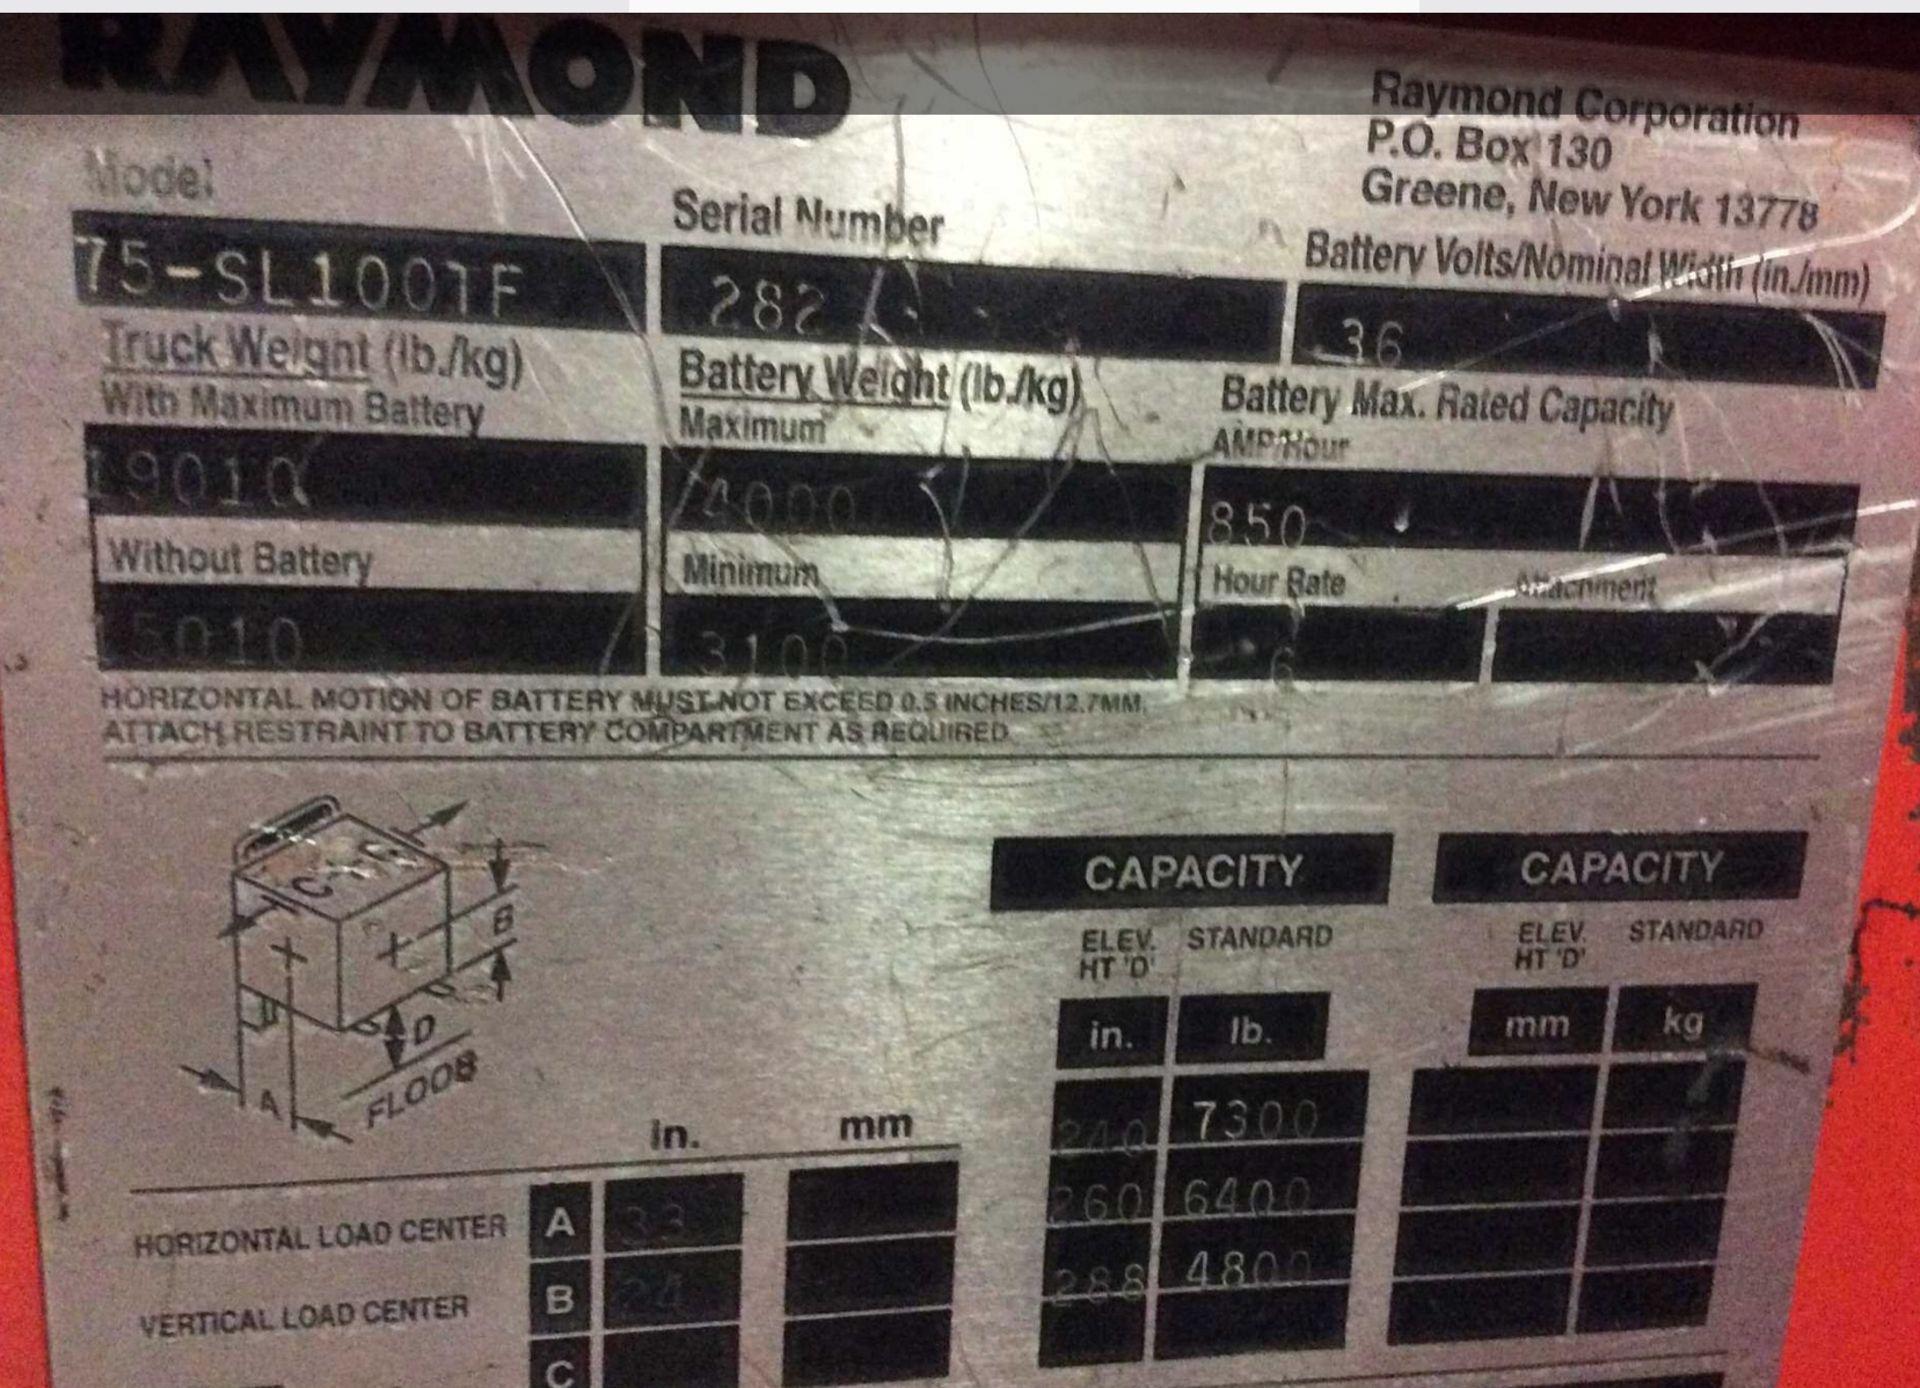 Lot 35 - RAYMOND 7,000-LB. CAP SIDE LOADING FORKLIFT MODEL 75-SC100TF *LOCATED IN MI*